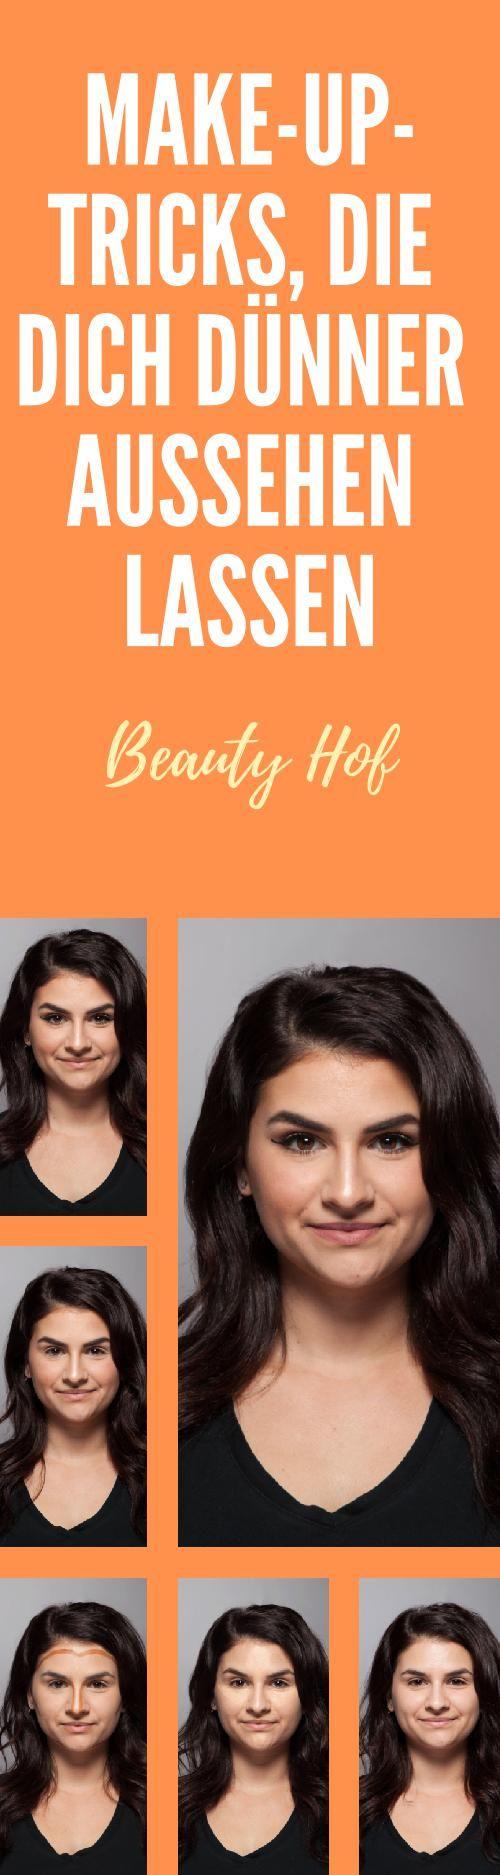 Cosmetics Face Foundation Brand HOF Liquid Foundation